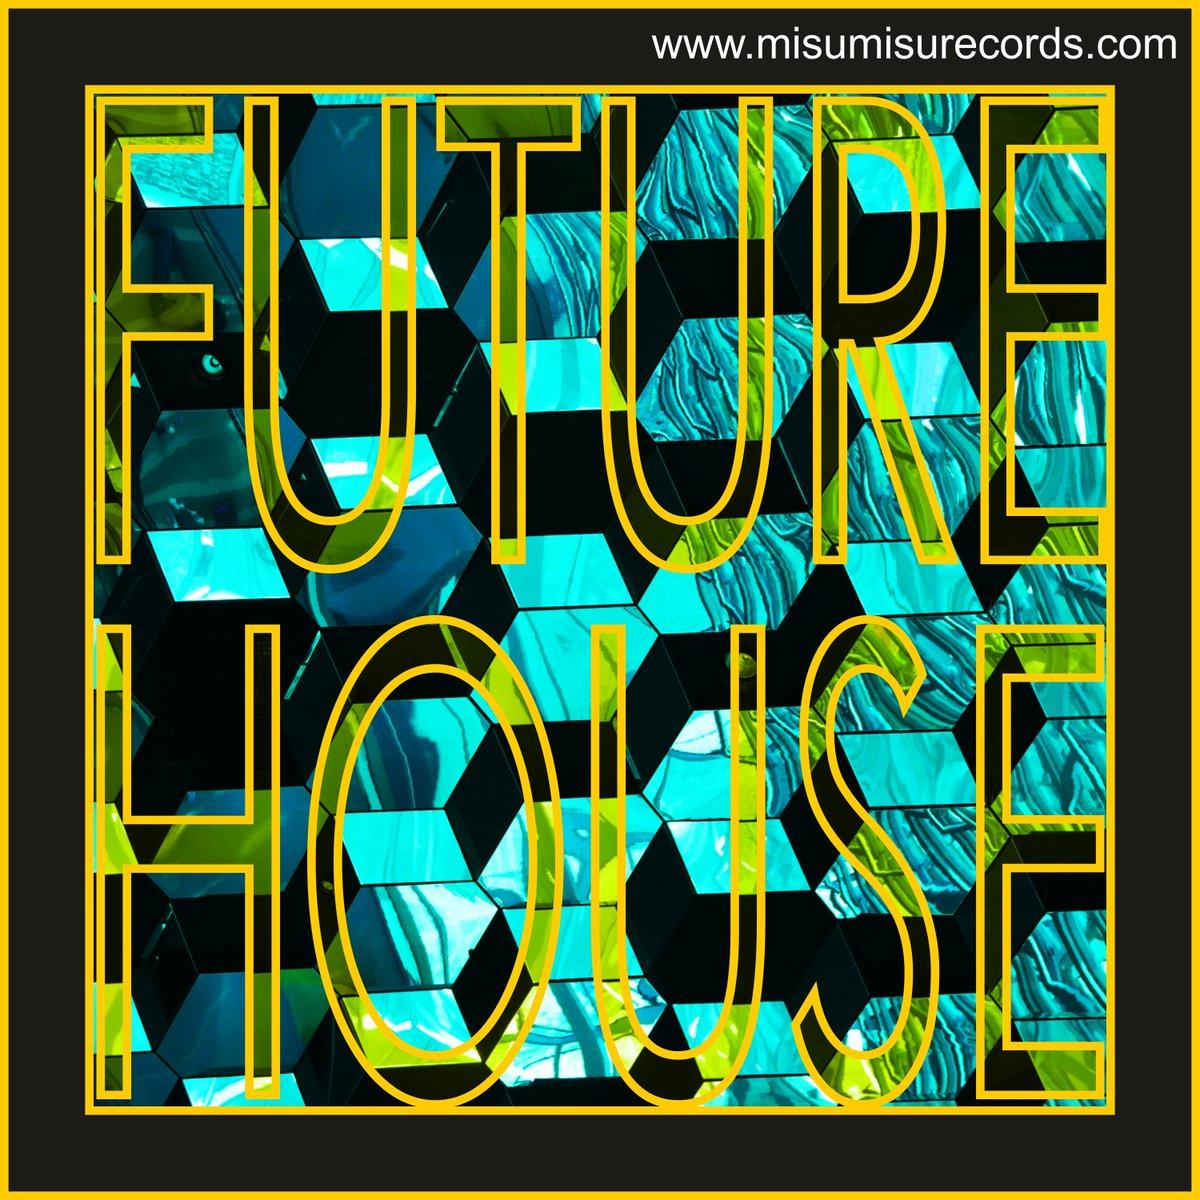 Follow us https://t.co/OrjJTXQtjm #label #records #dj #producer #futurehouse #marbella #ibiza #evissa #mykonos #barcelona #madrid #berlin #paris #london #miami #moscow #newyork #tokyo #cuartaraart https://t.co/l2YovHjv2D